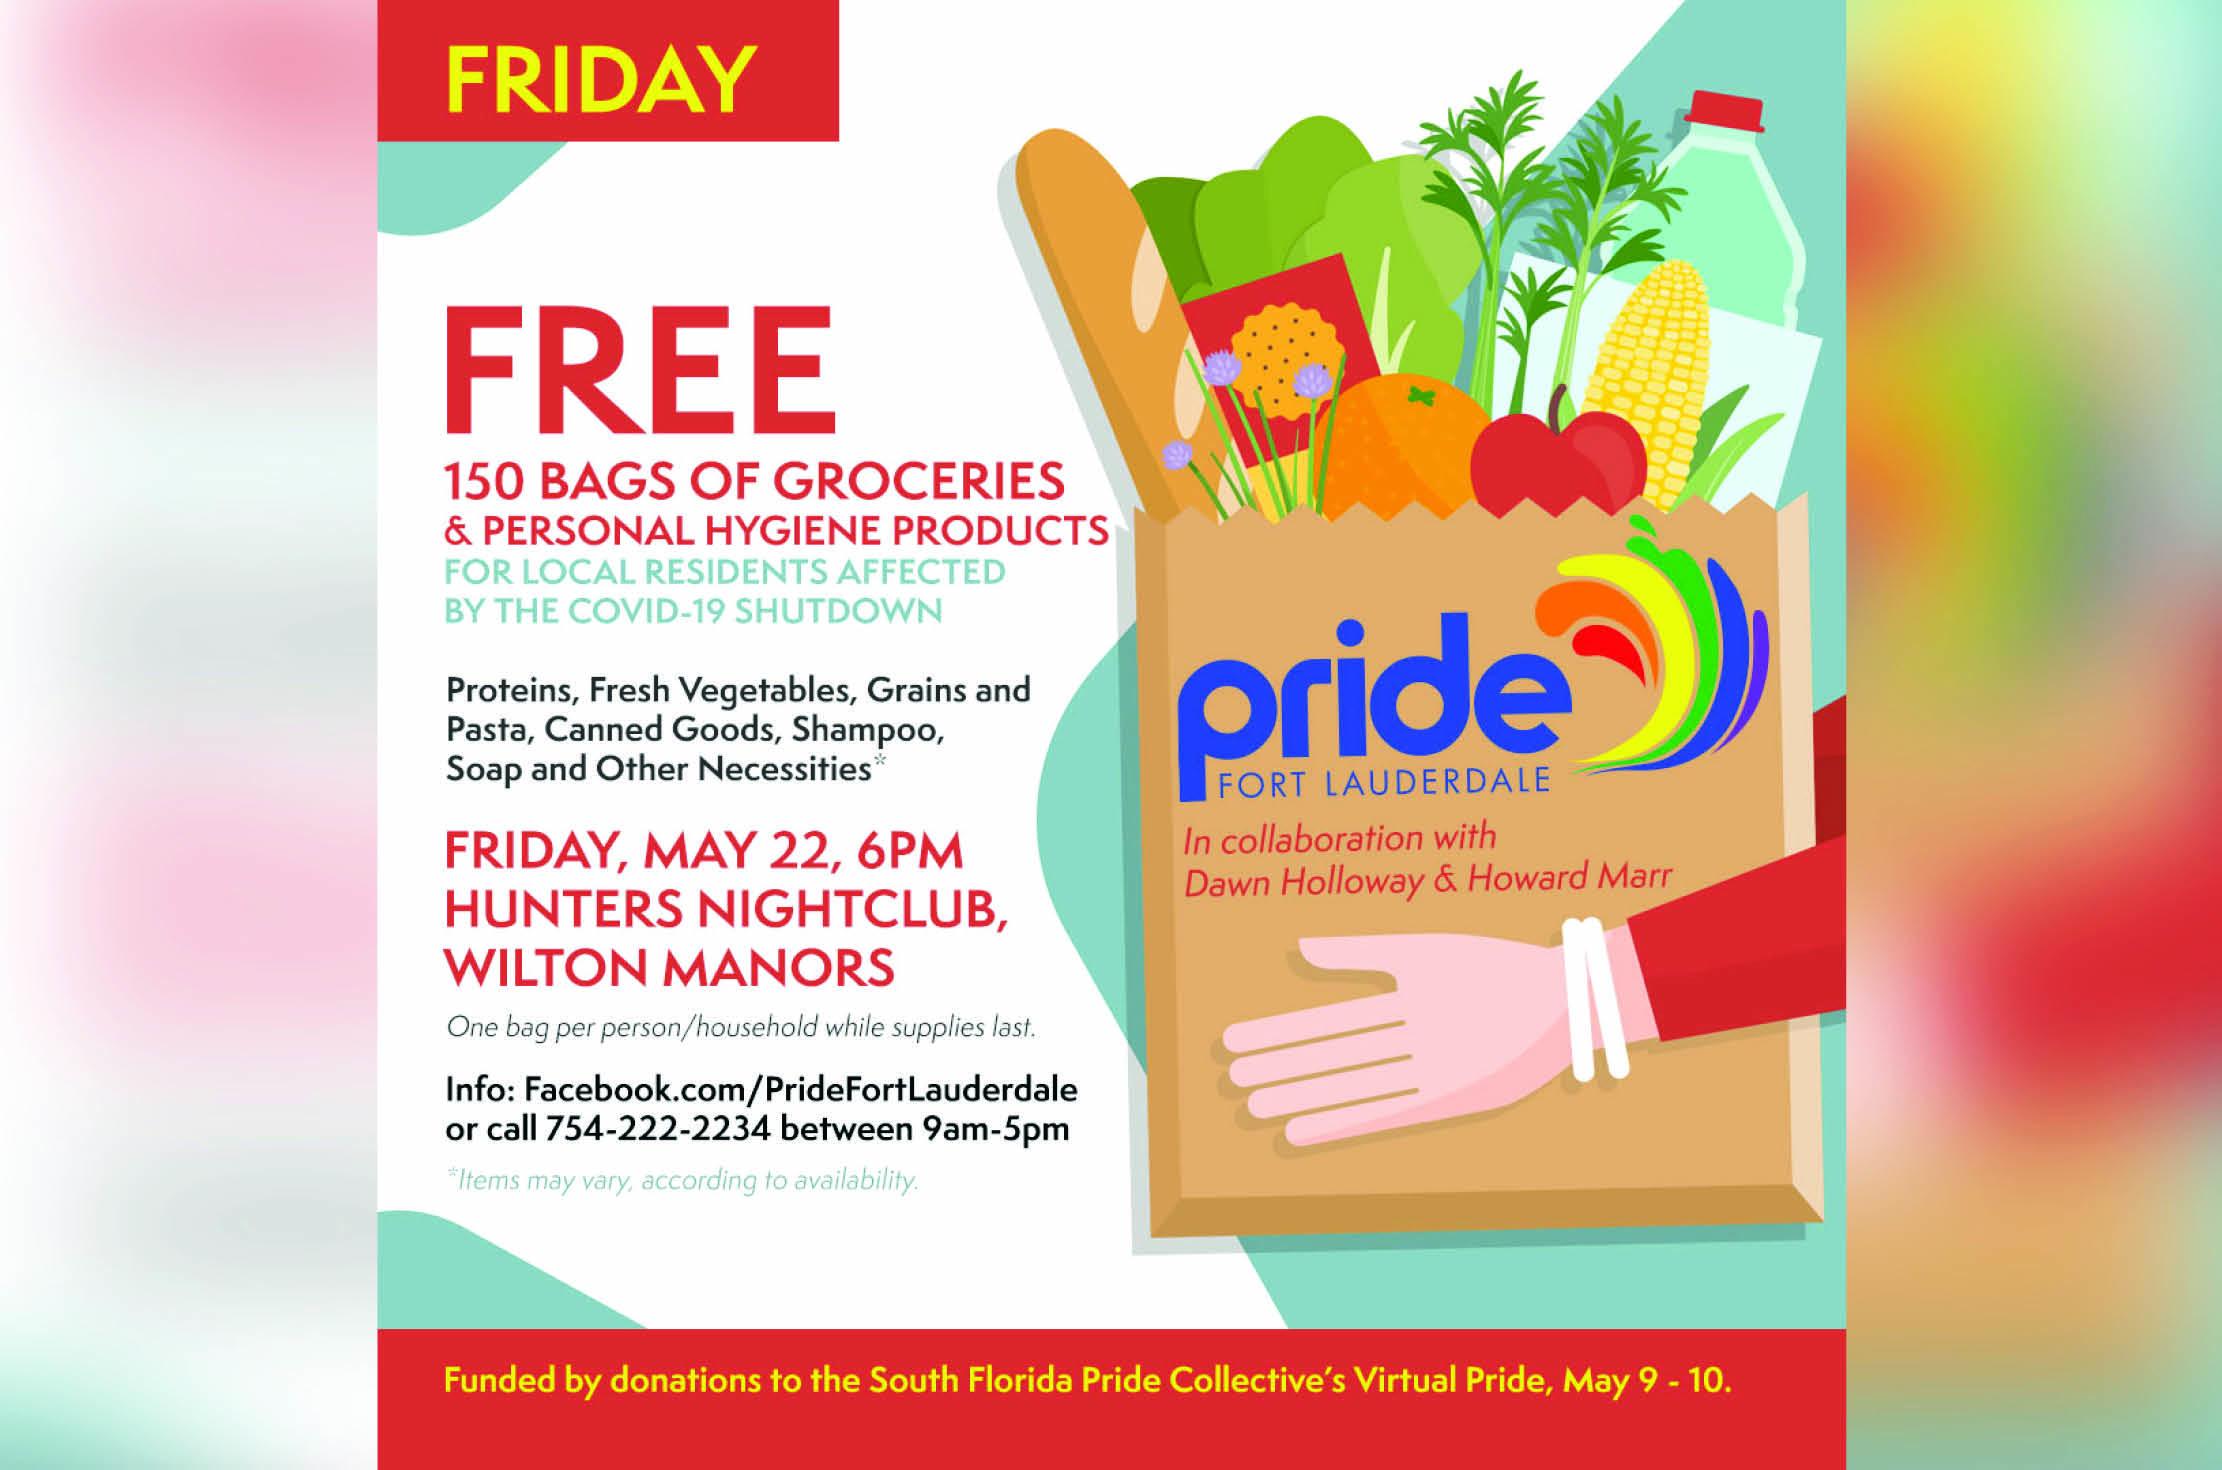 Pride Fort Lauderdale Grocery Giveaway